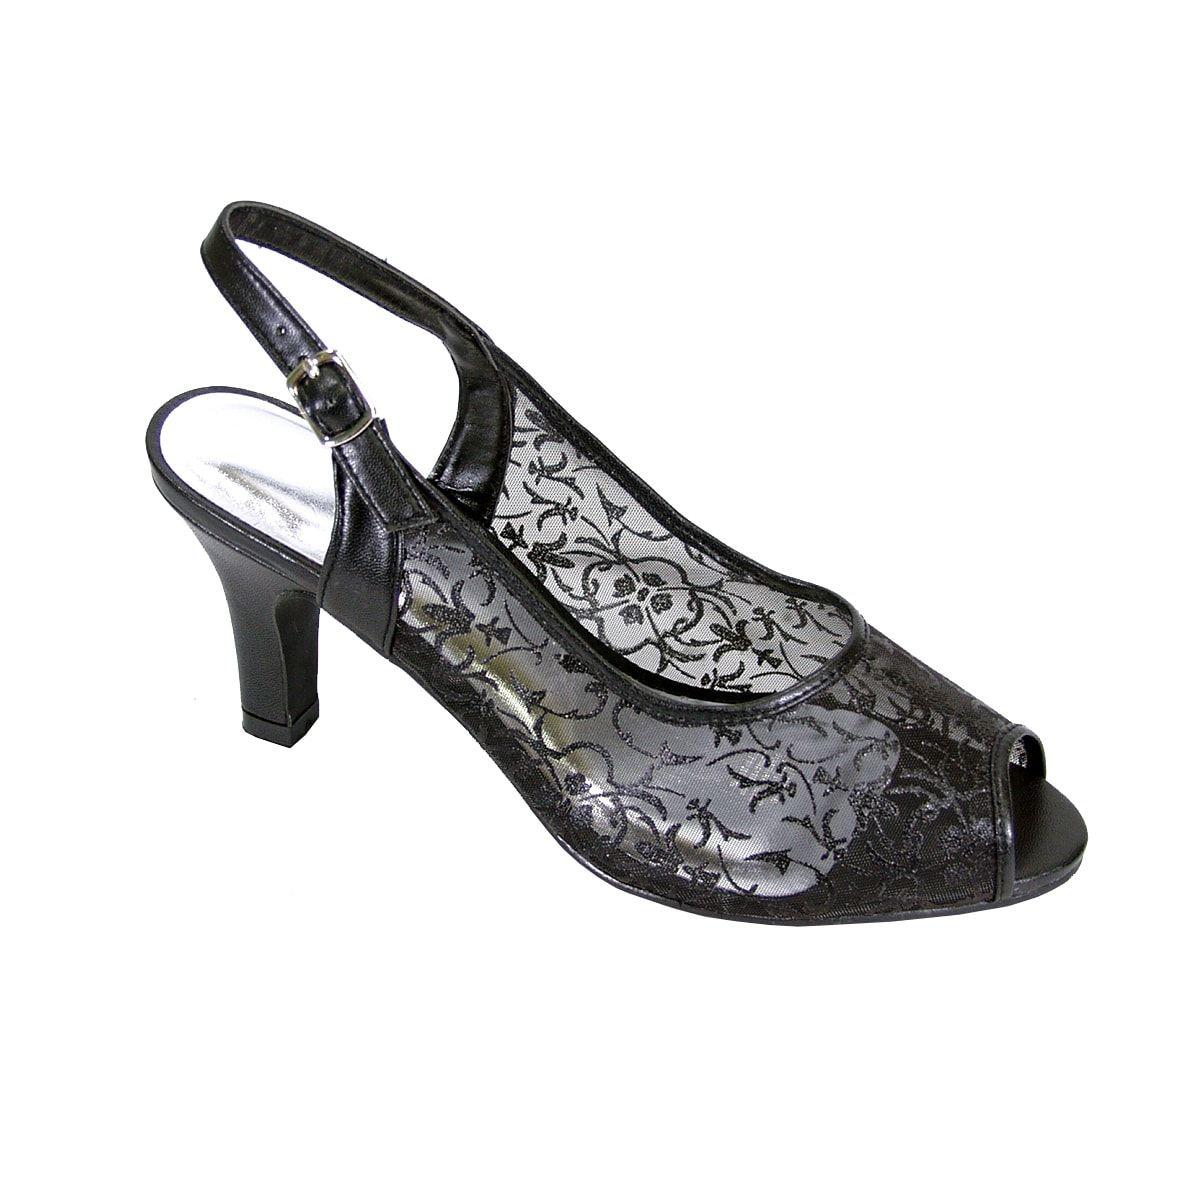 d23fd0493b8 FIC Floral Ashley Women Extra Wide Width Peep Toe Heel (8.5 Extra Wide -  Black)